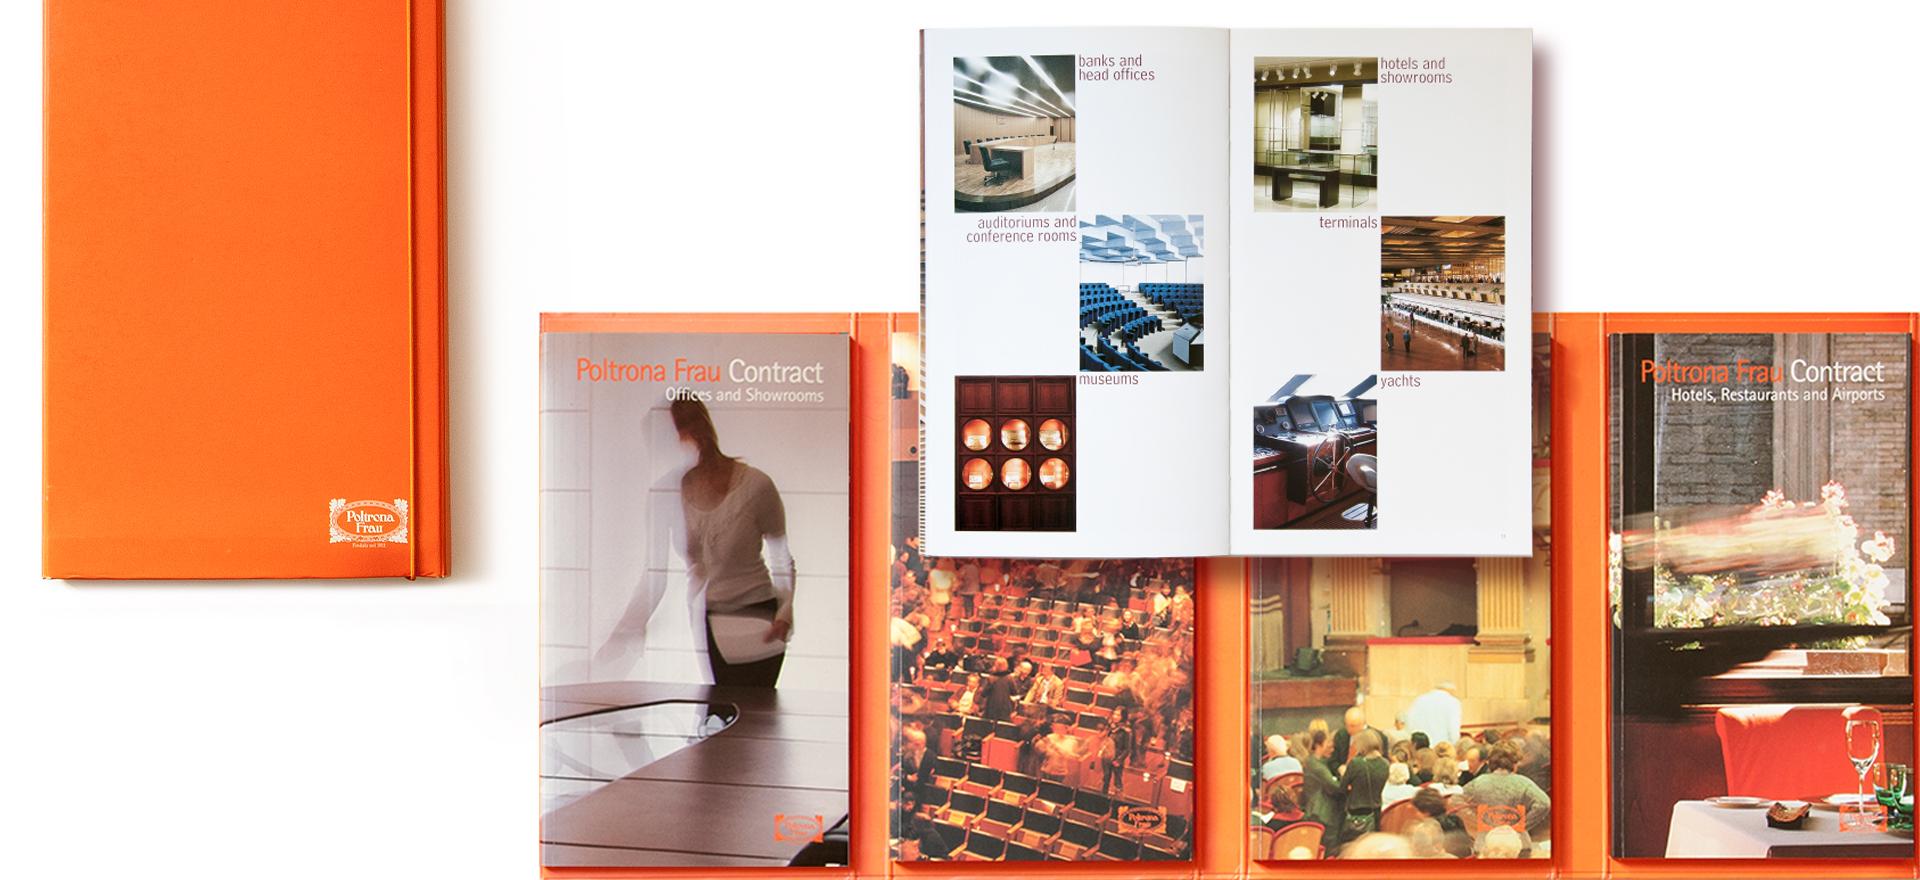 Offices & Showroom Catalogue | Art Direction | Graphic Design | Branding | Poltrona Frau | Mario Trimarchi Design | Fragile